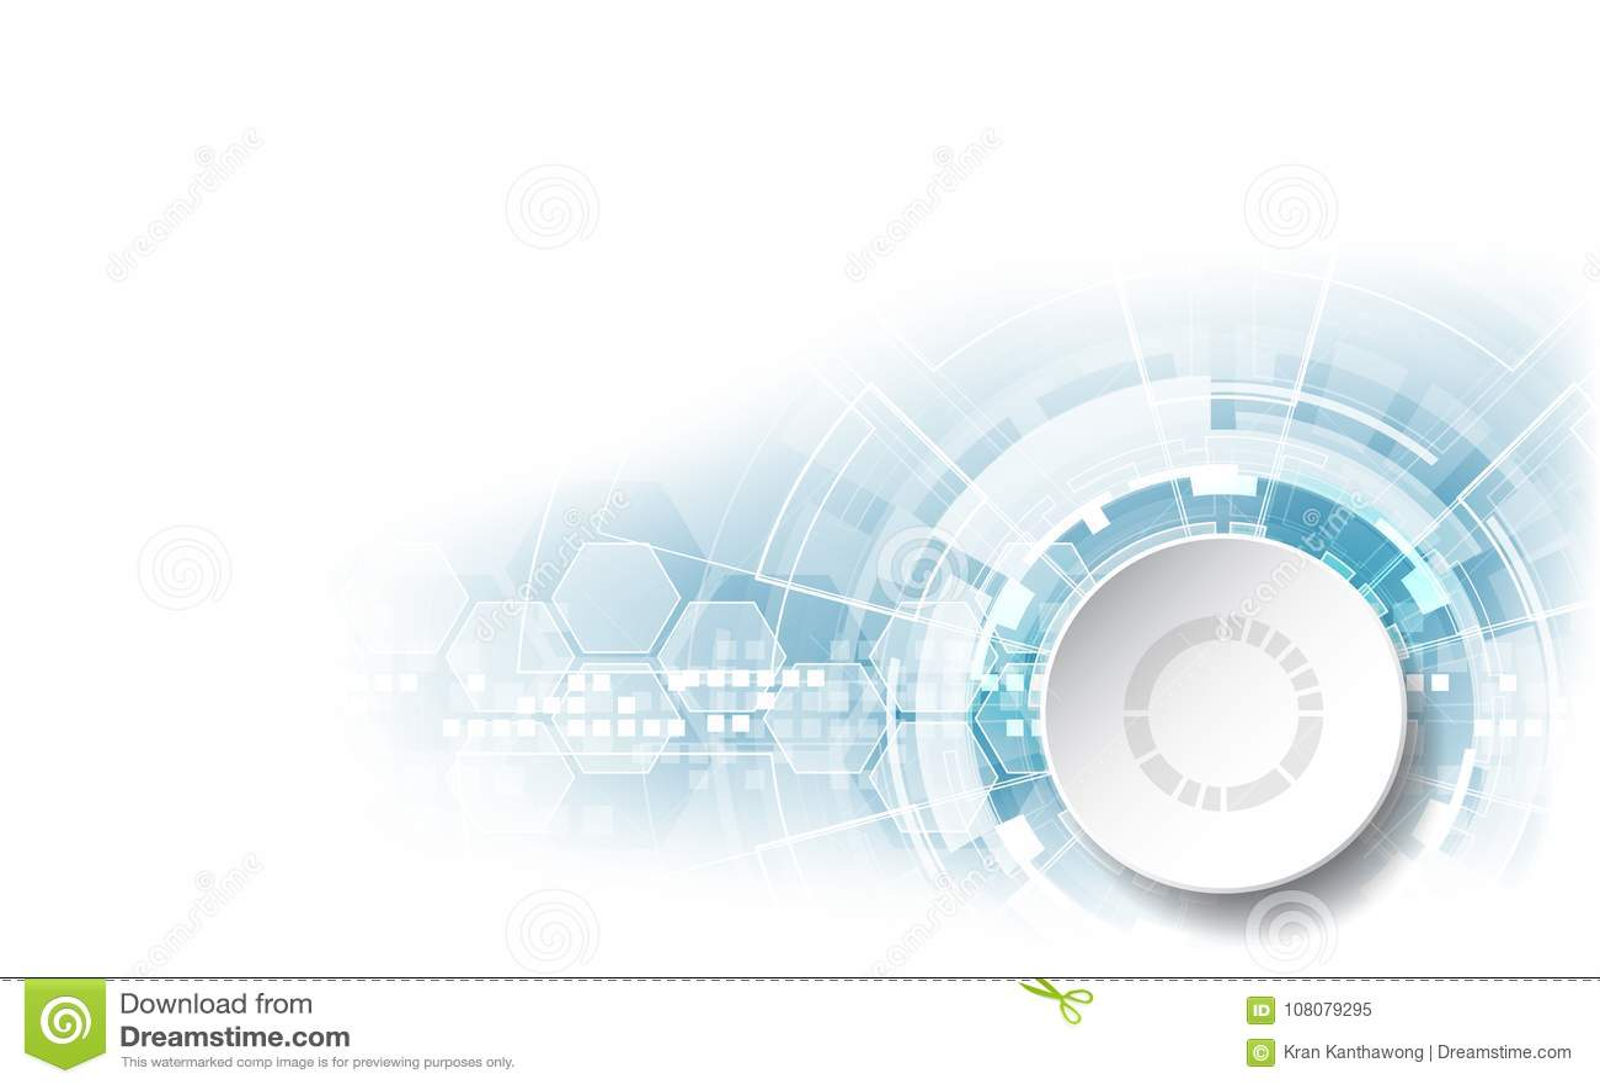 Vector Abstract Futuristic Circuit Board Illustration High